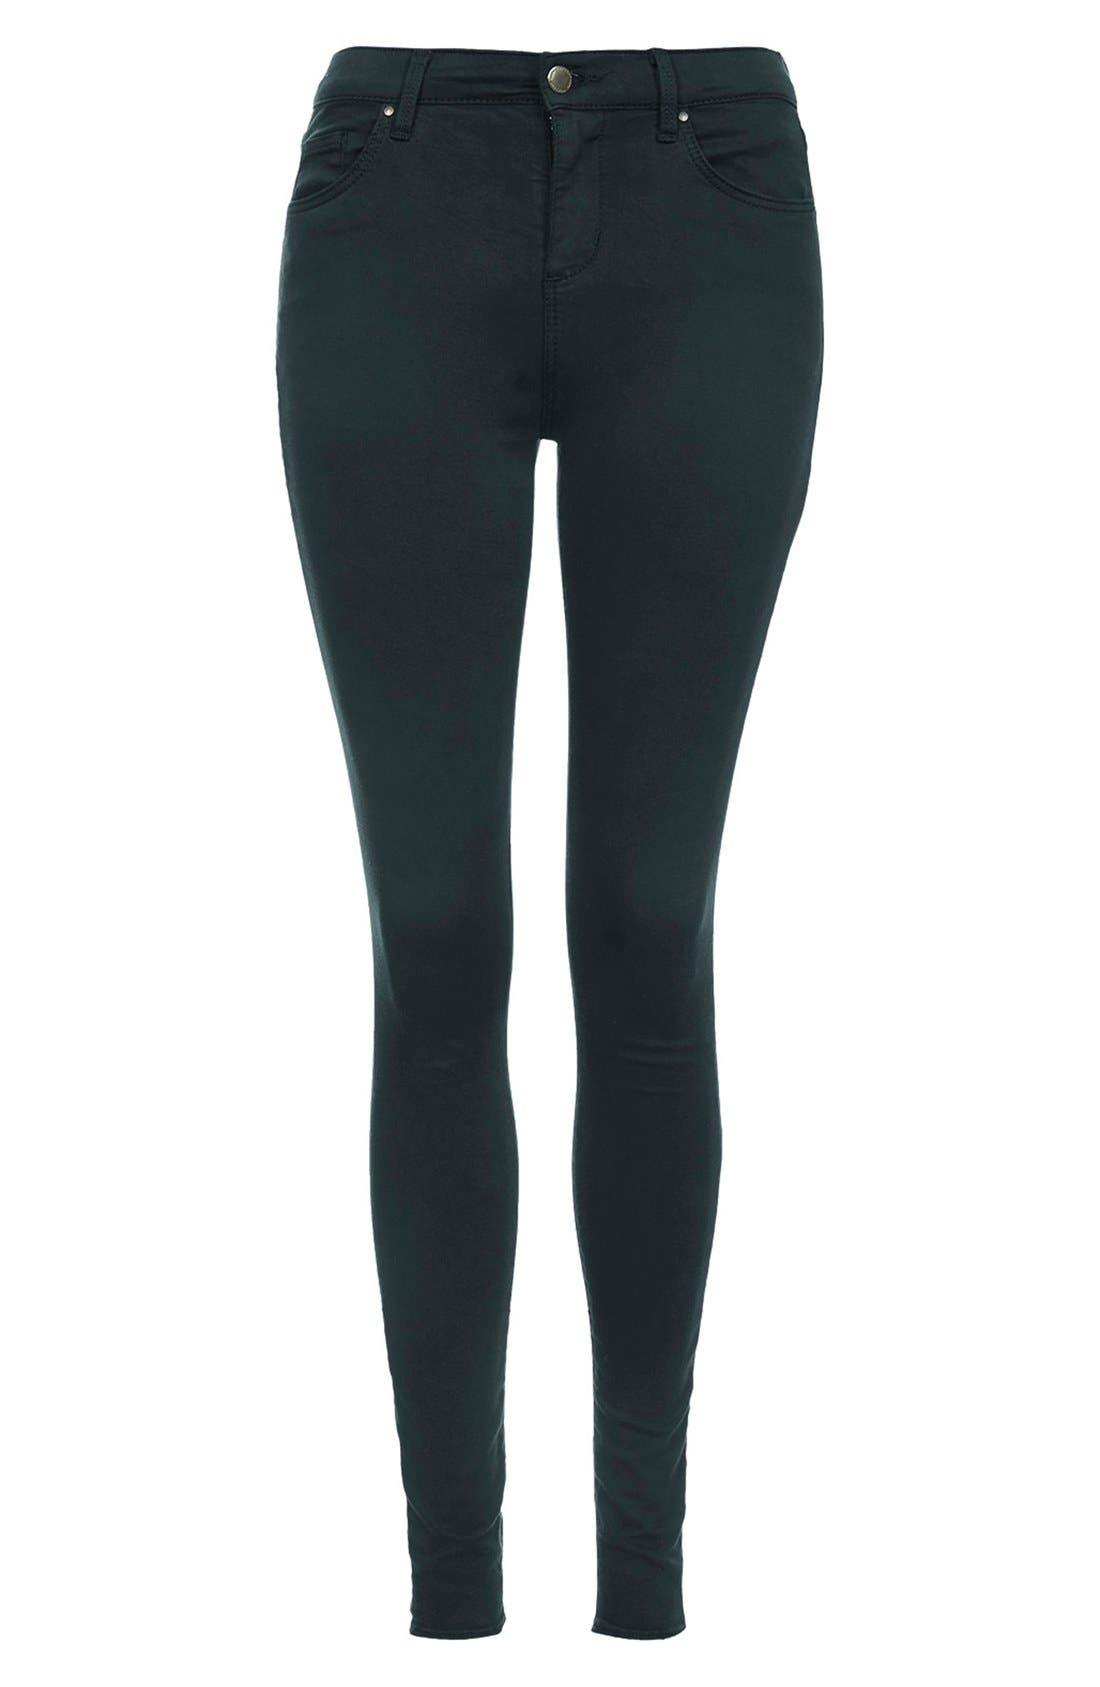 Alternate Image 3  - Topshop Moto 'Leigh' High Rise Skinny Jeans (Teal) (Regular & Short)